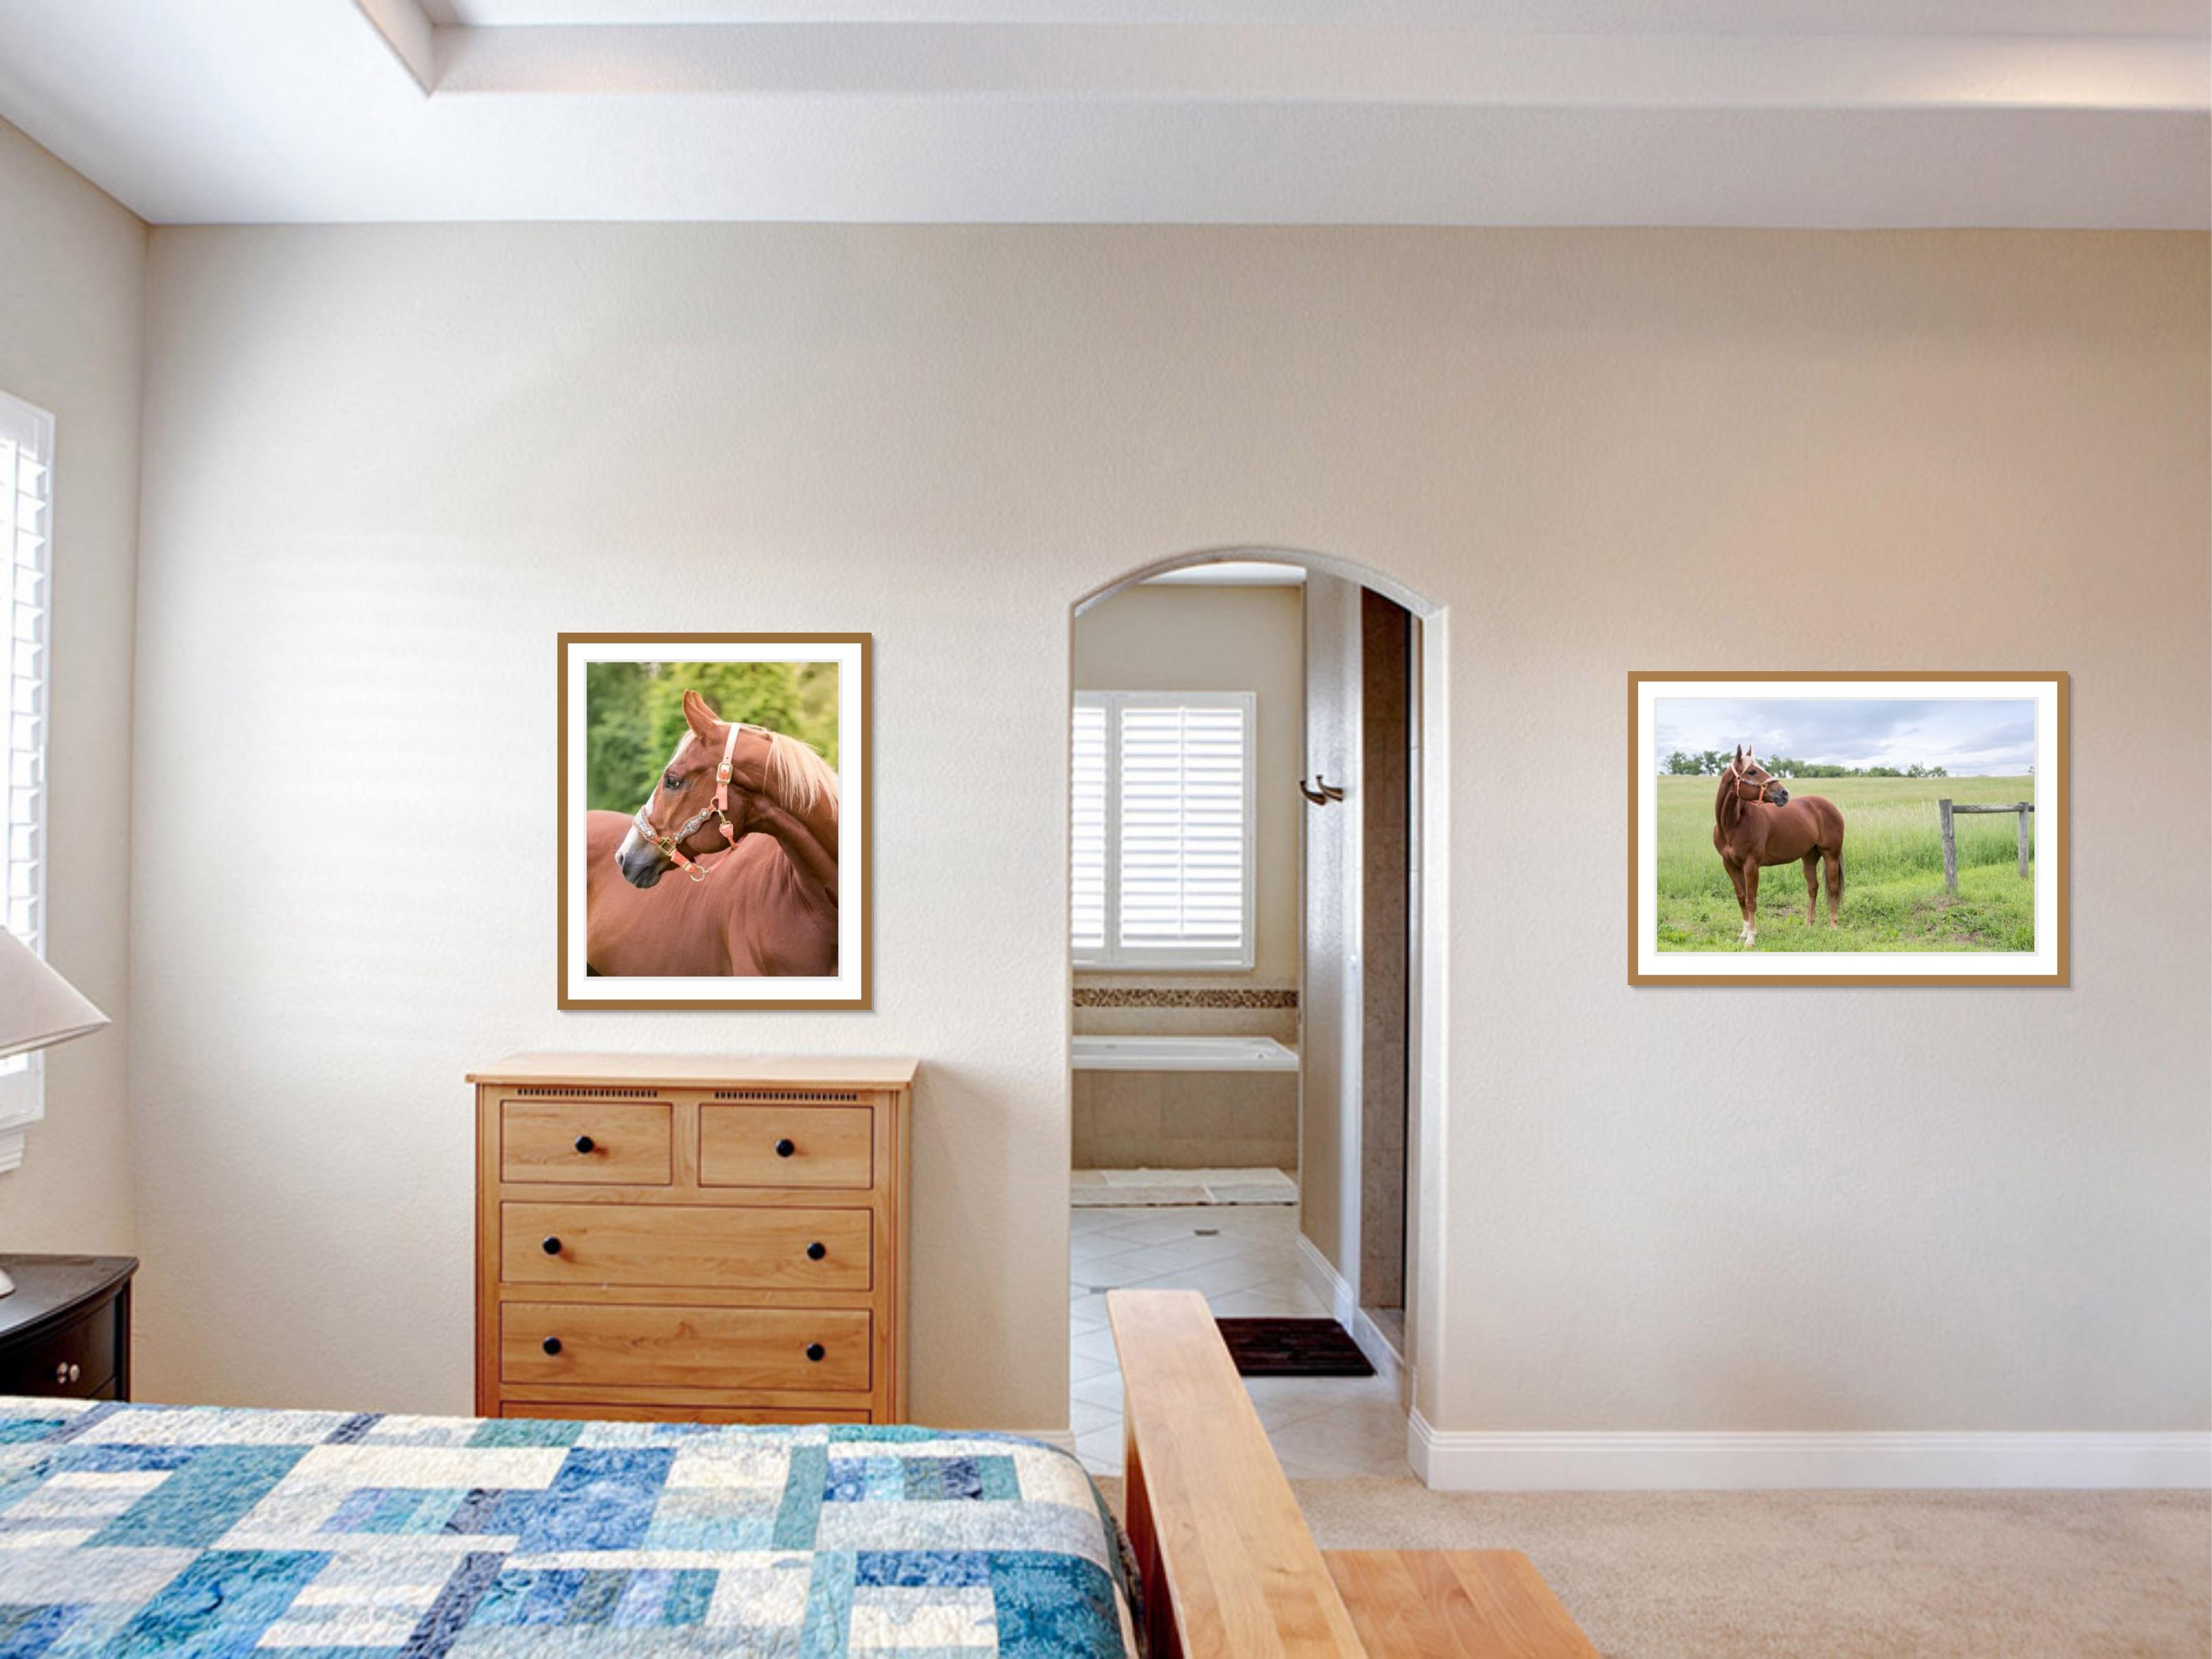 framed wall art of a horse on bedroom walls